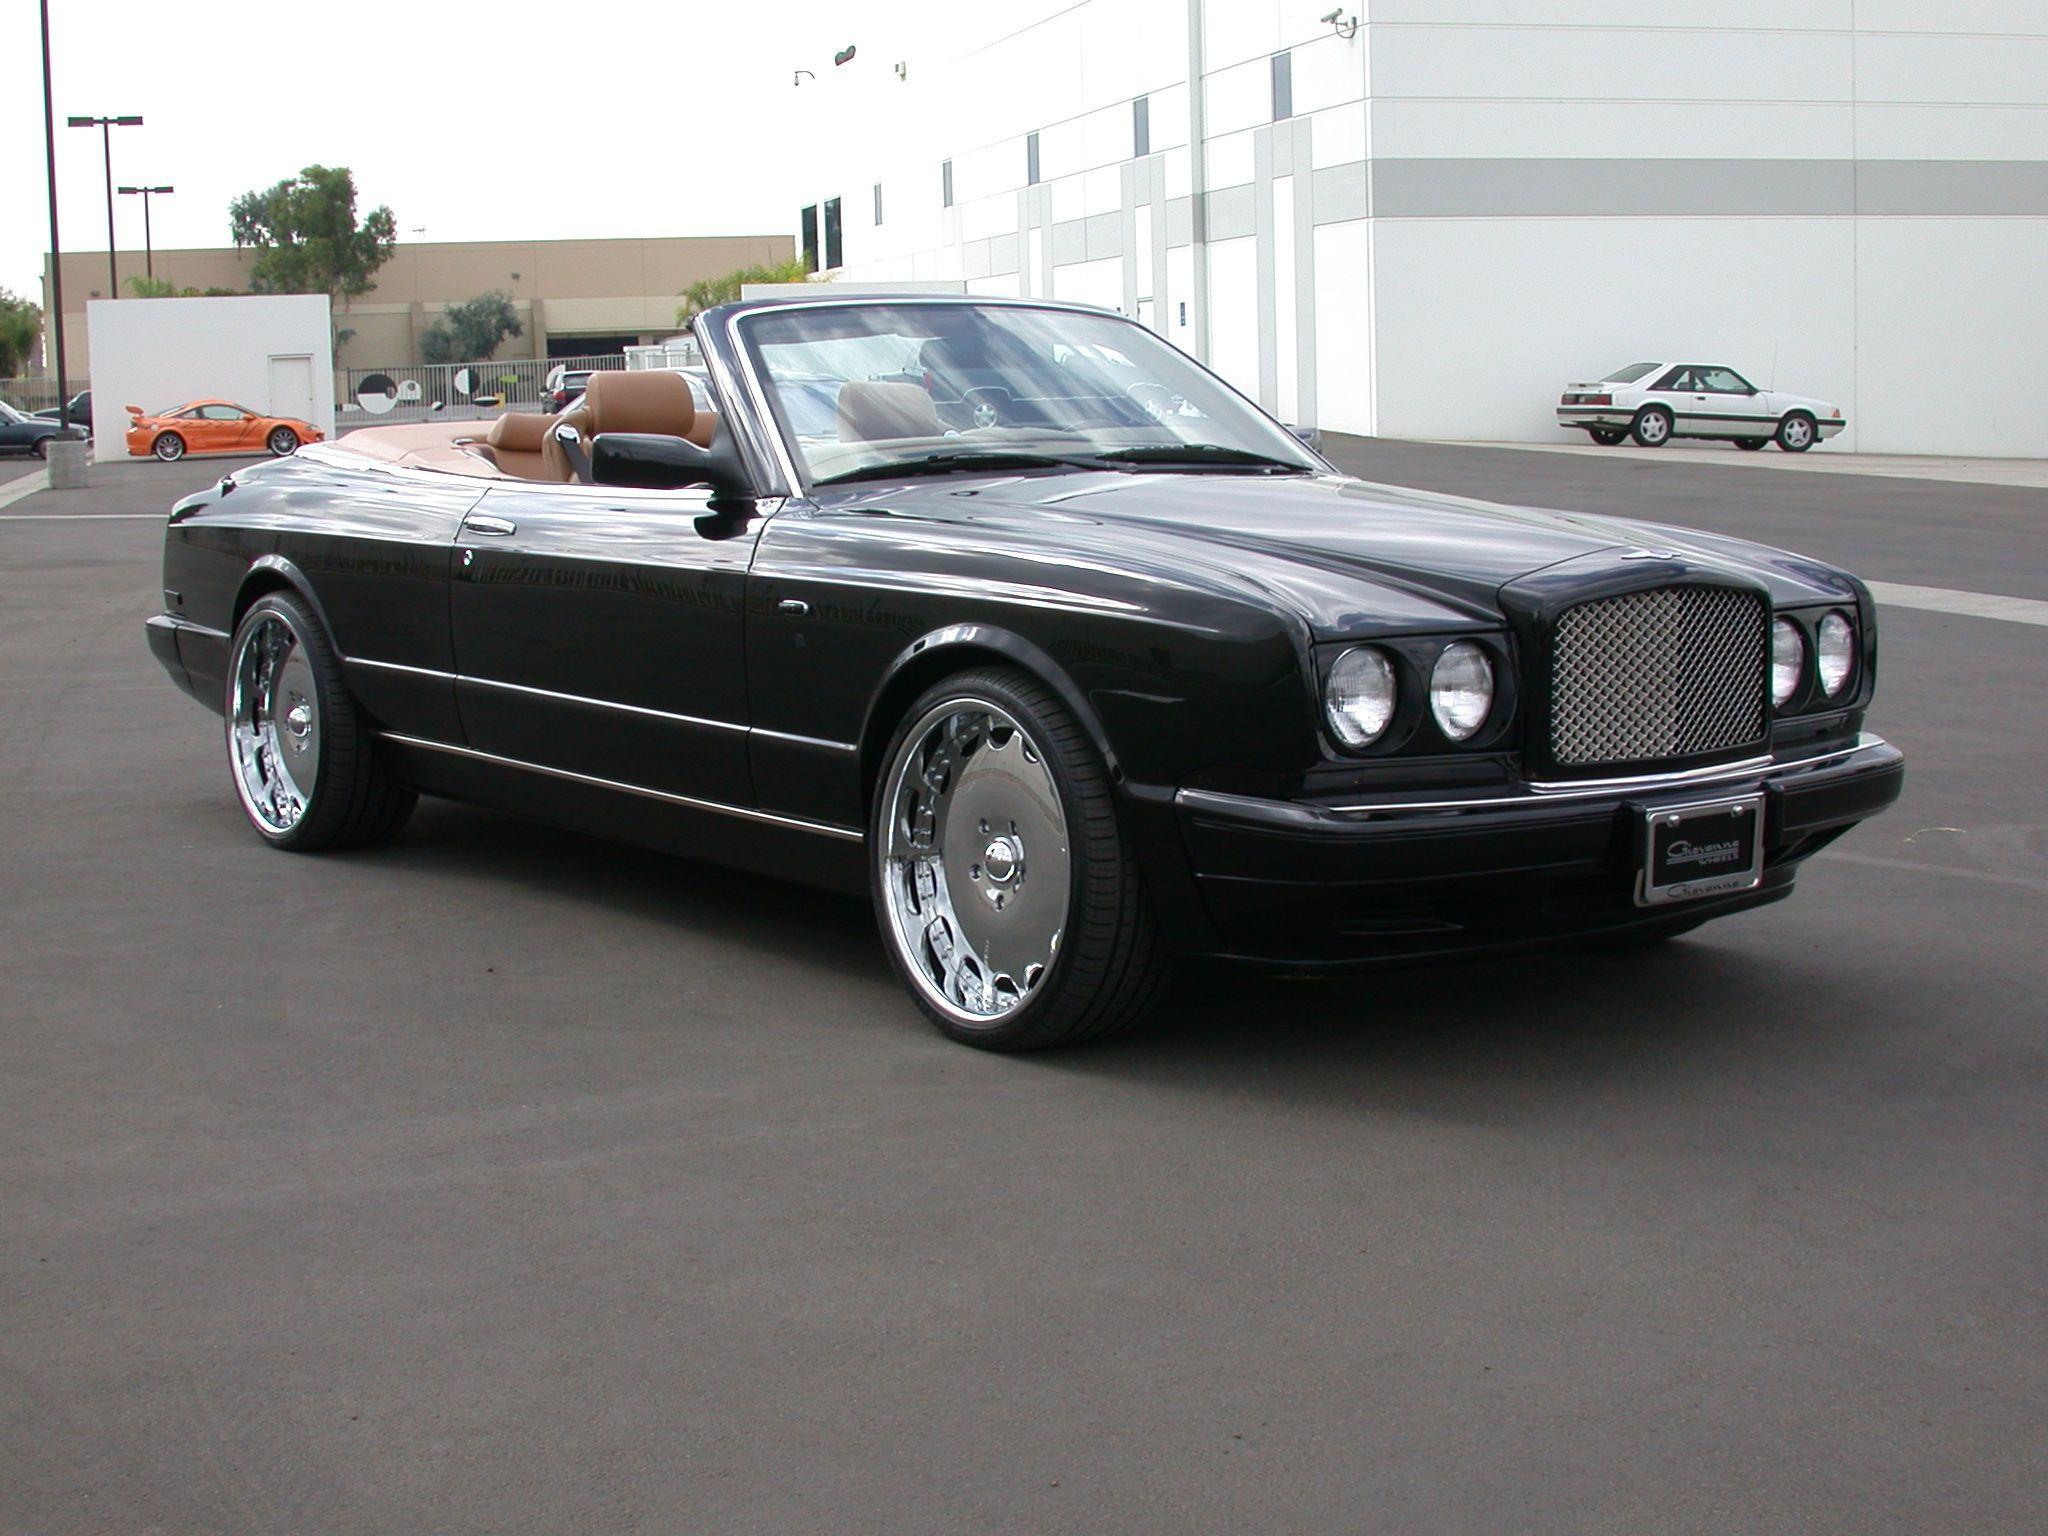 Bentley Azure Photos Photogallery With 50 Pics Carsbase Com